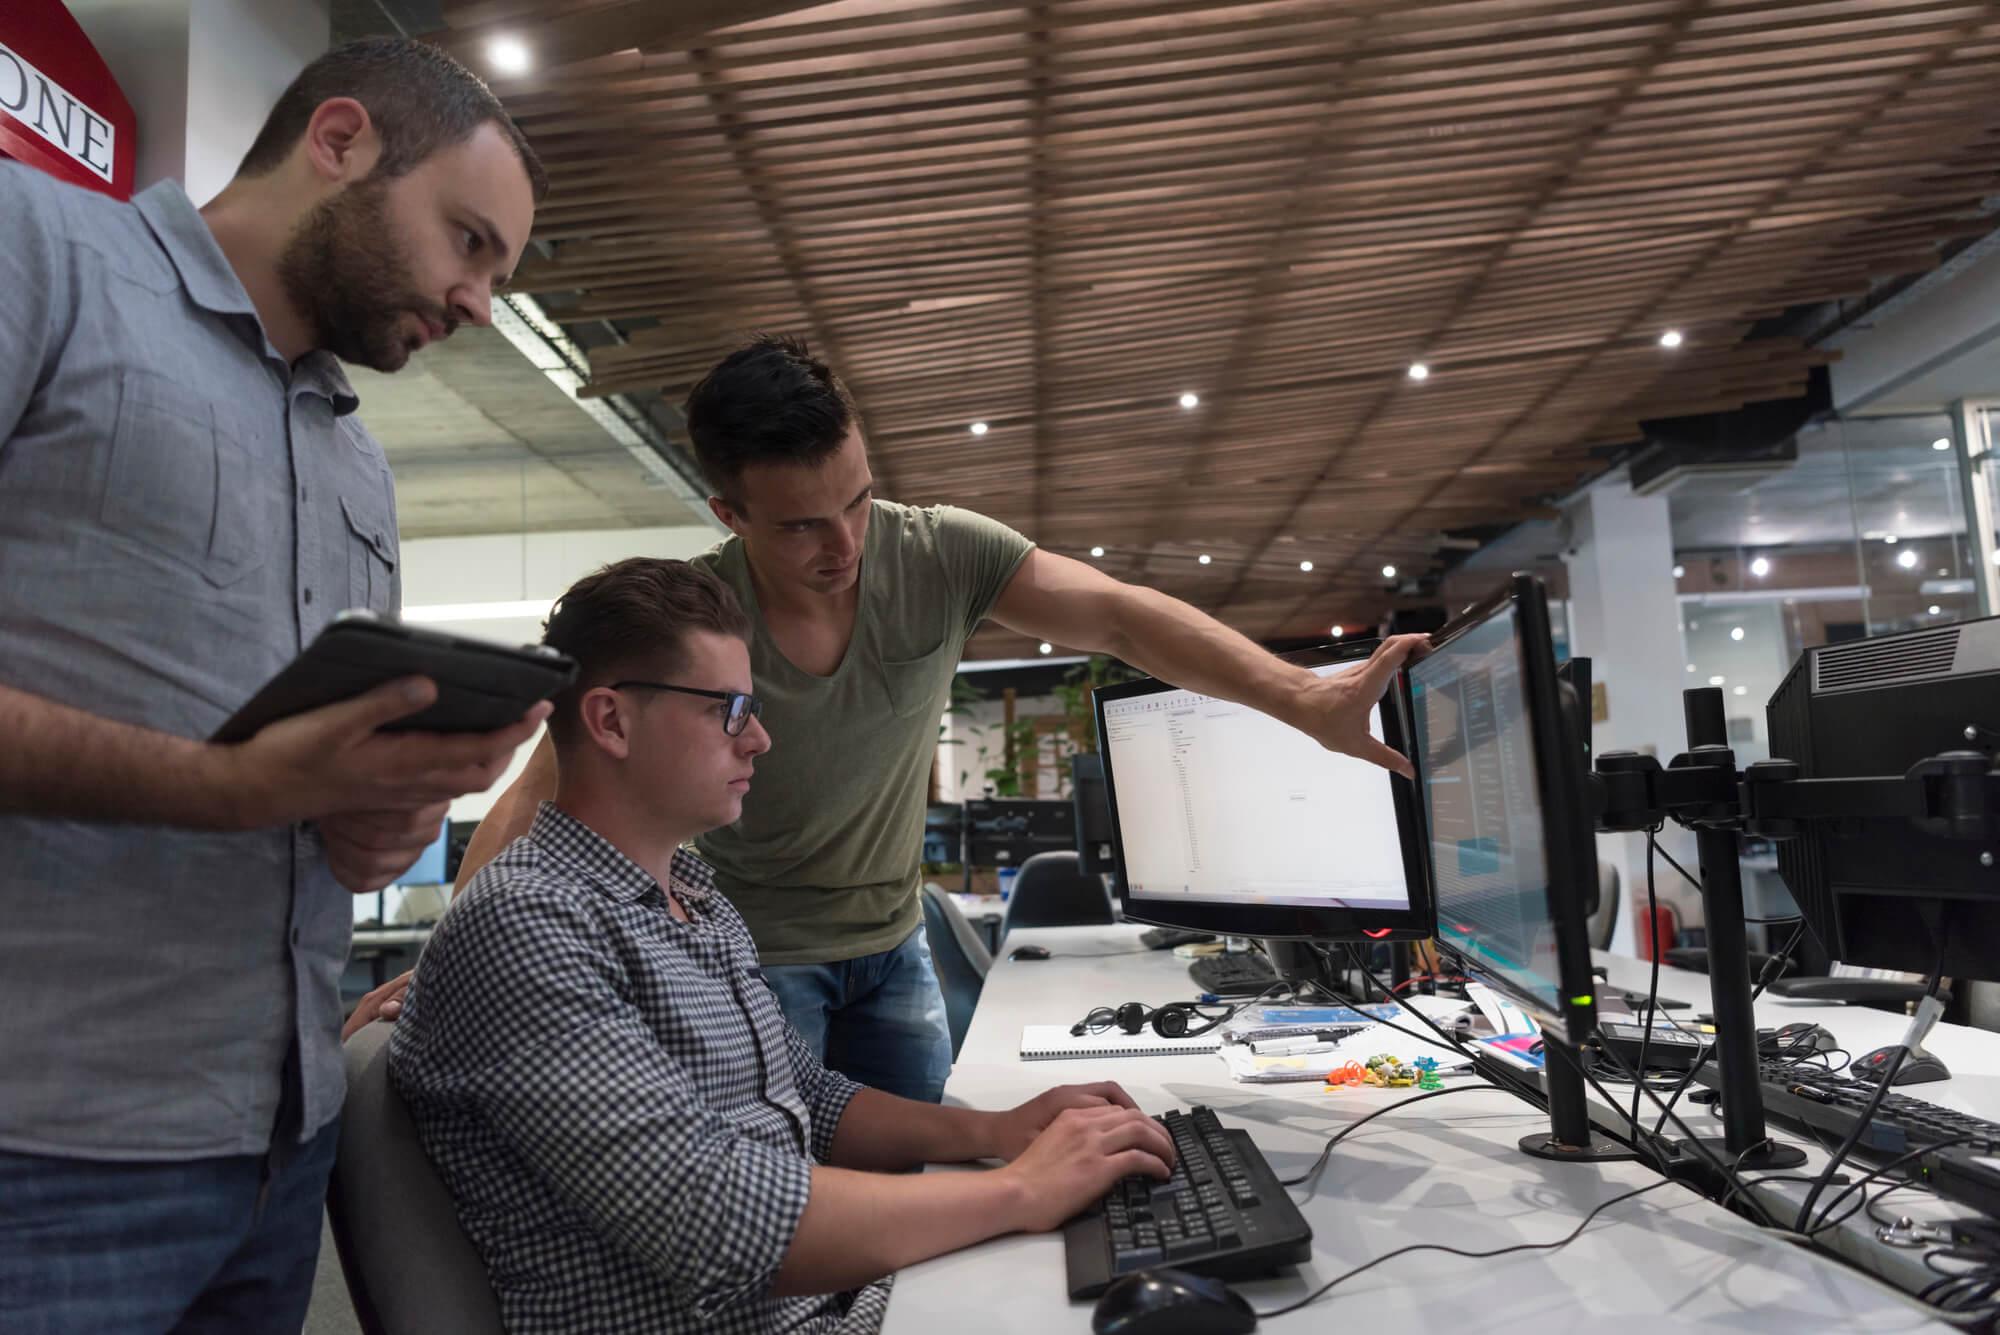 Os 7 maiores desafios de cloud computing para empresas brasileiras